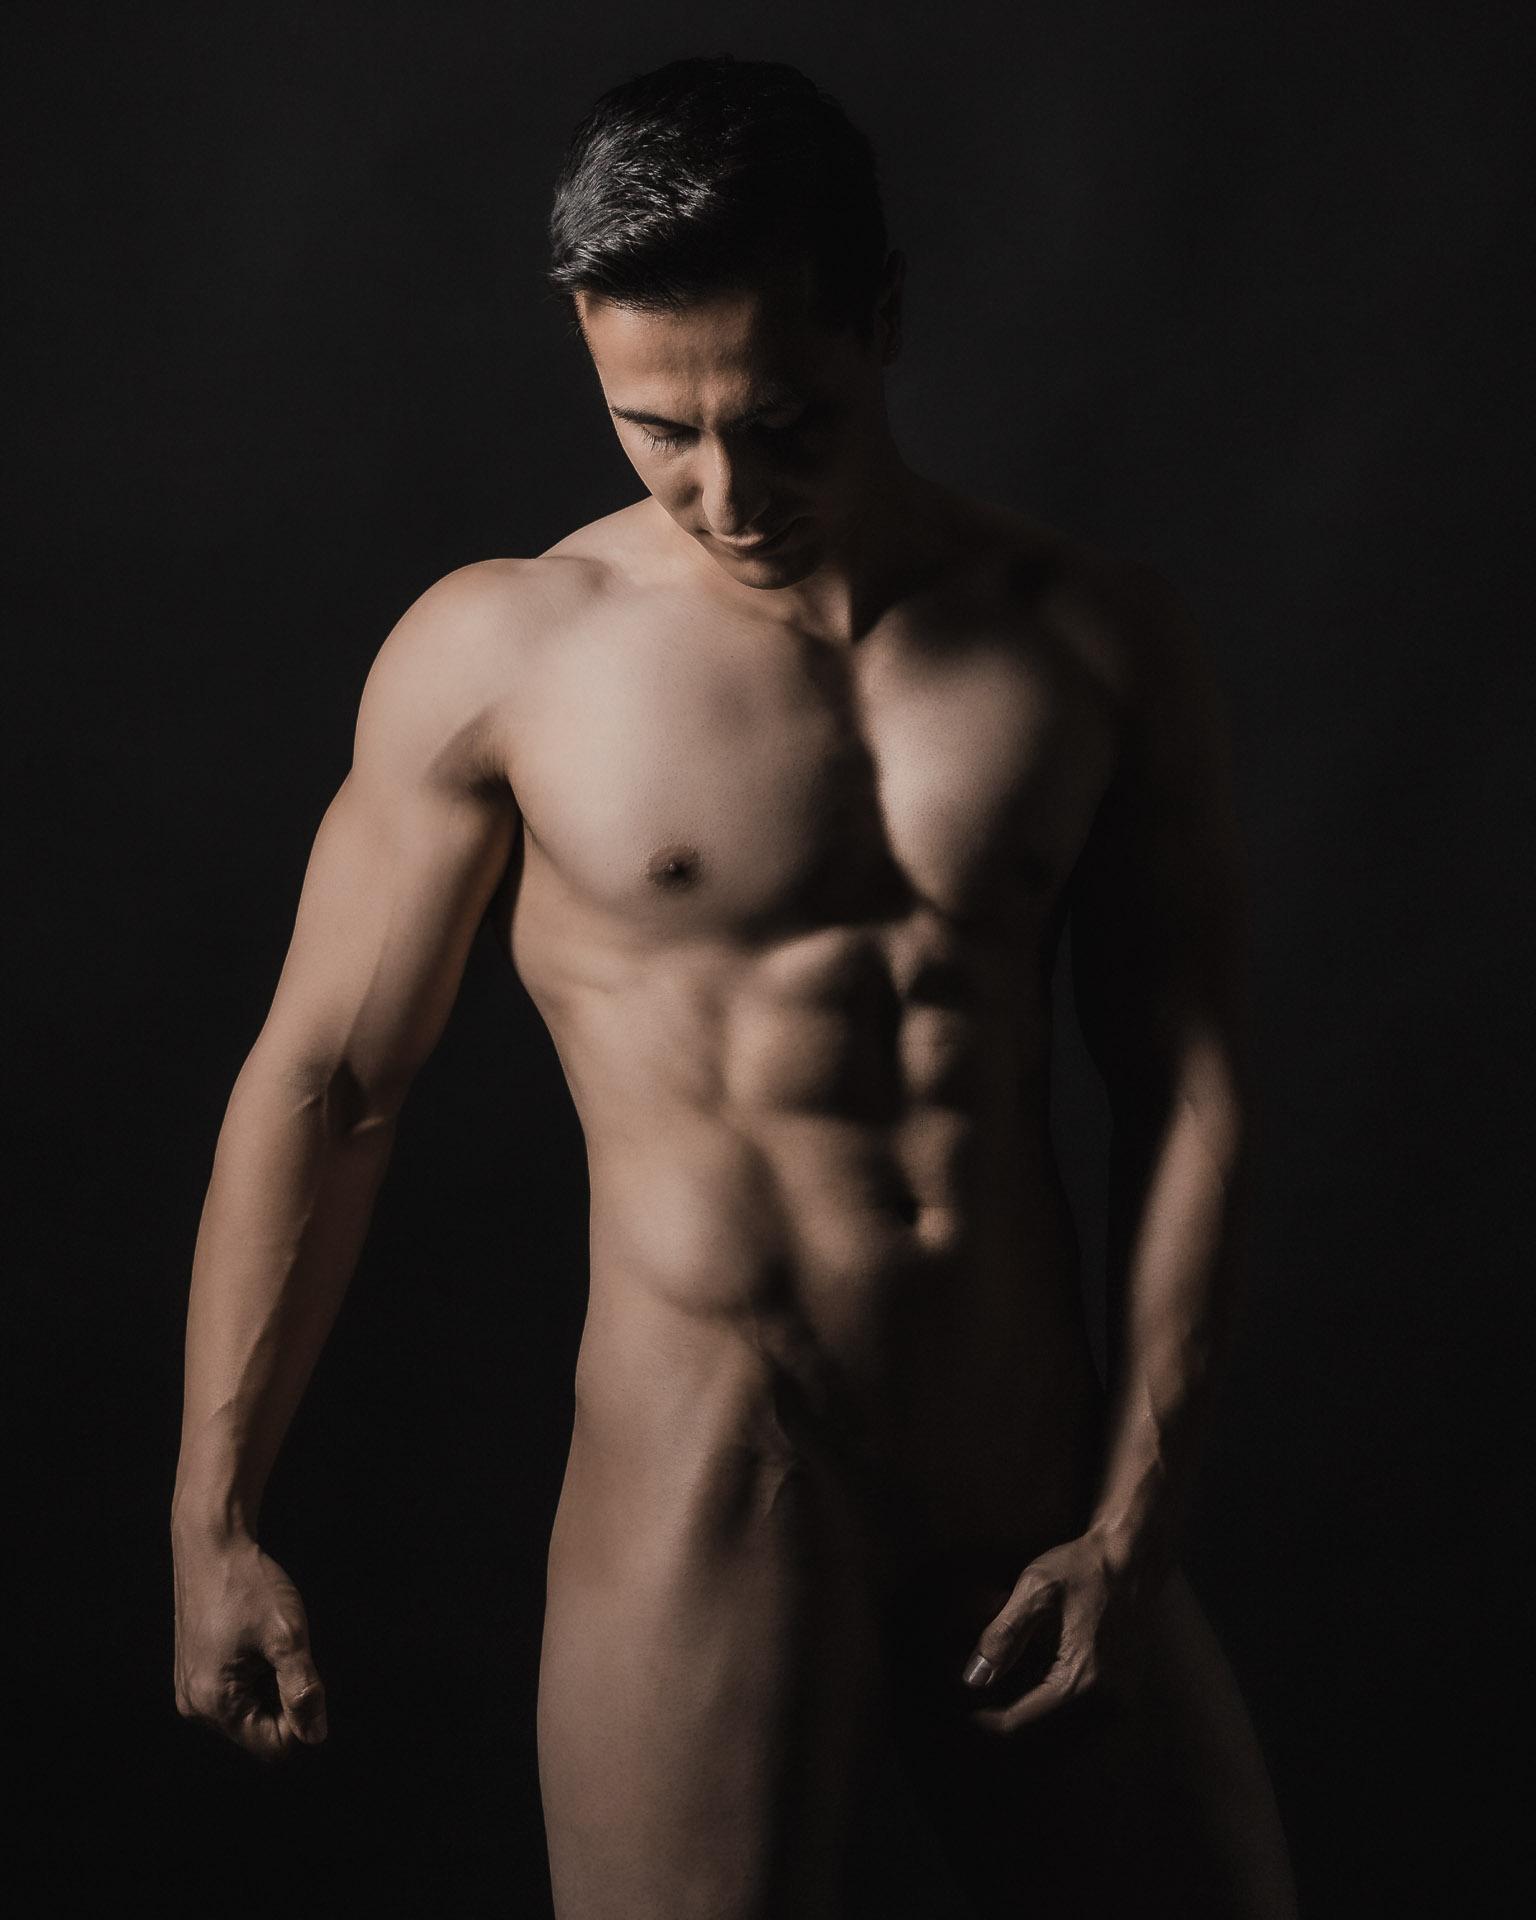 Männeraktfotografie-schwul-gay-photography